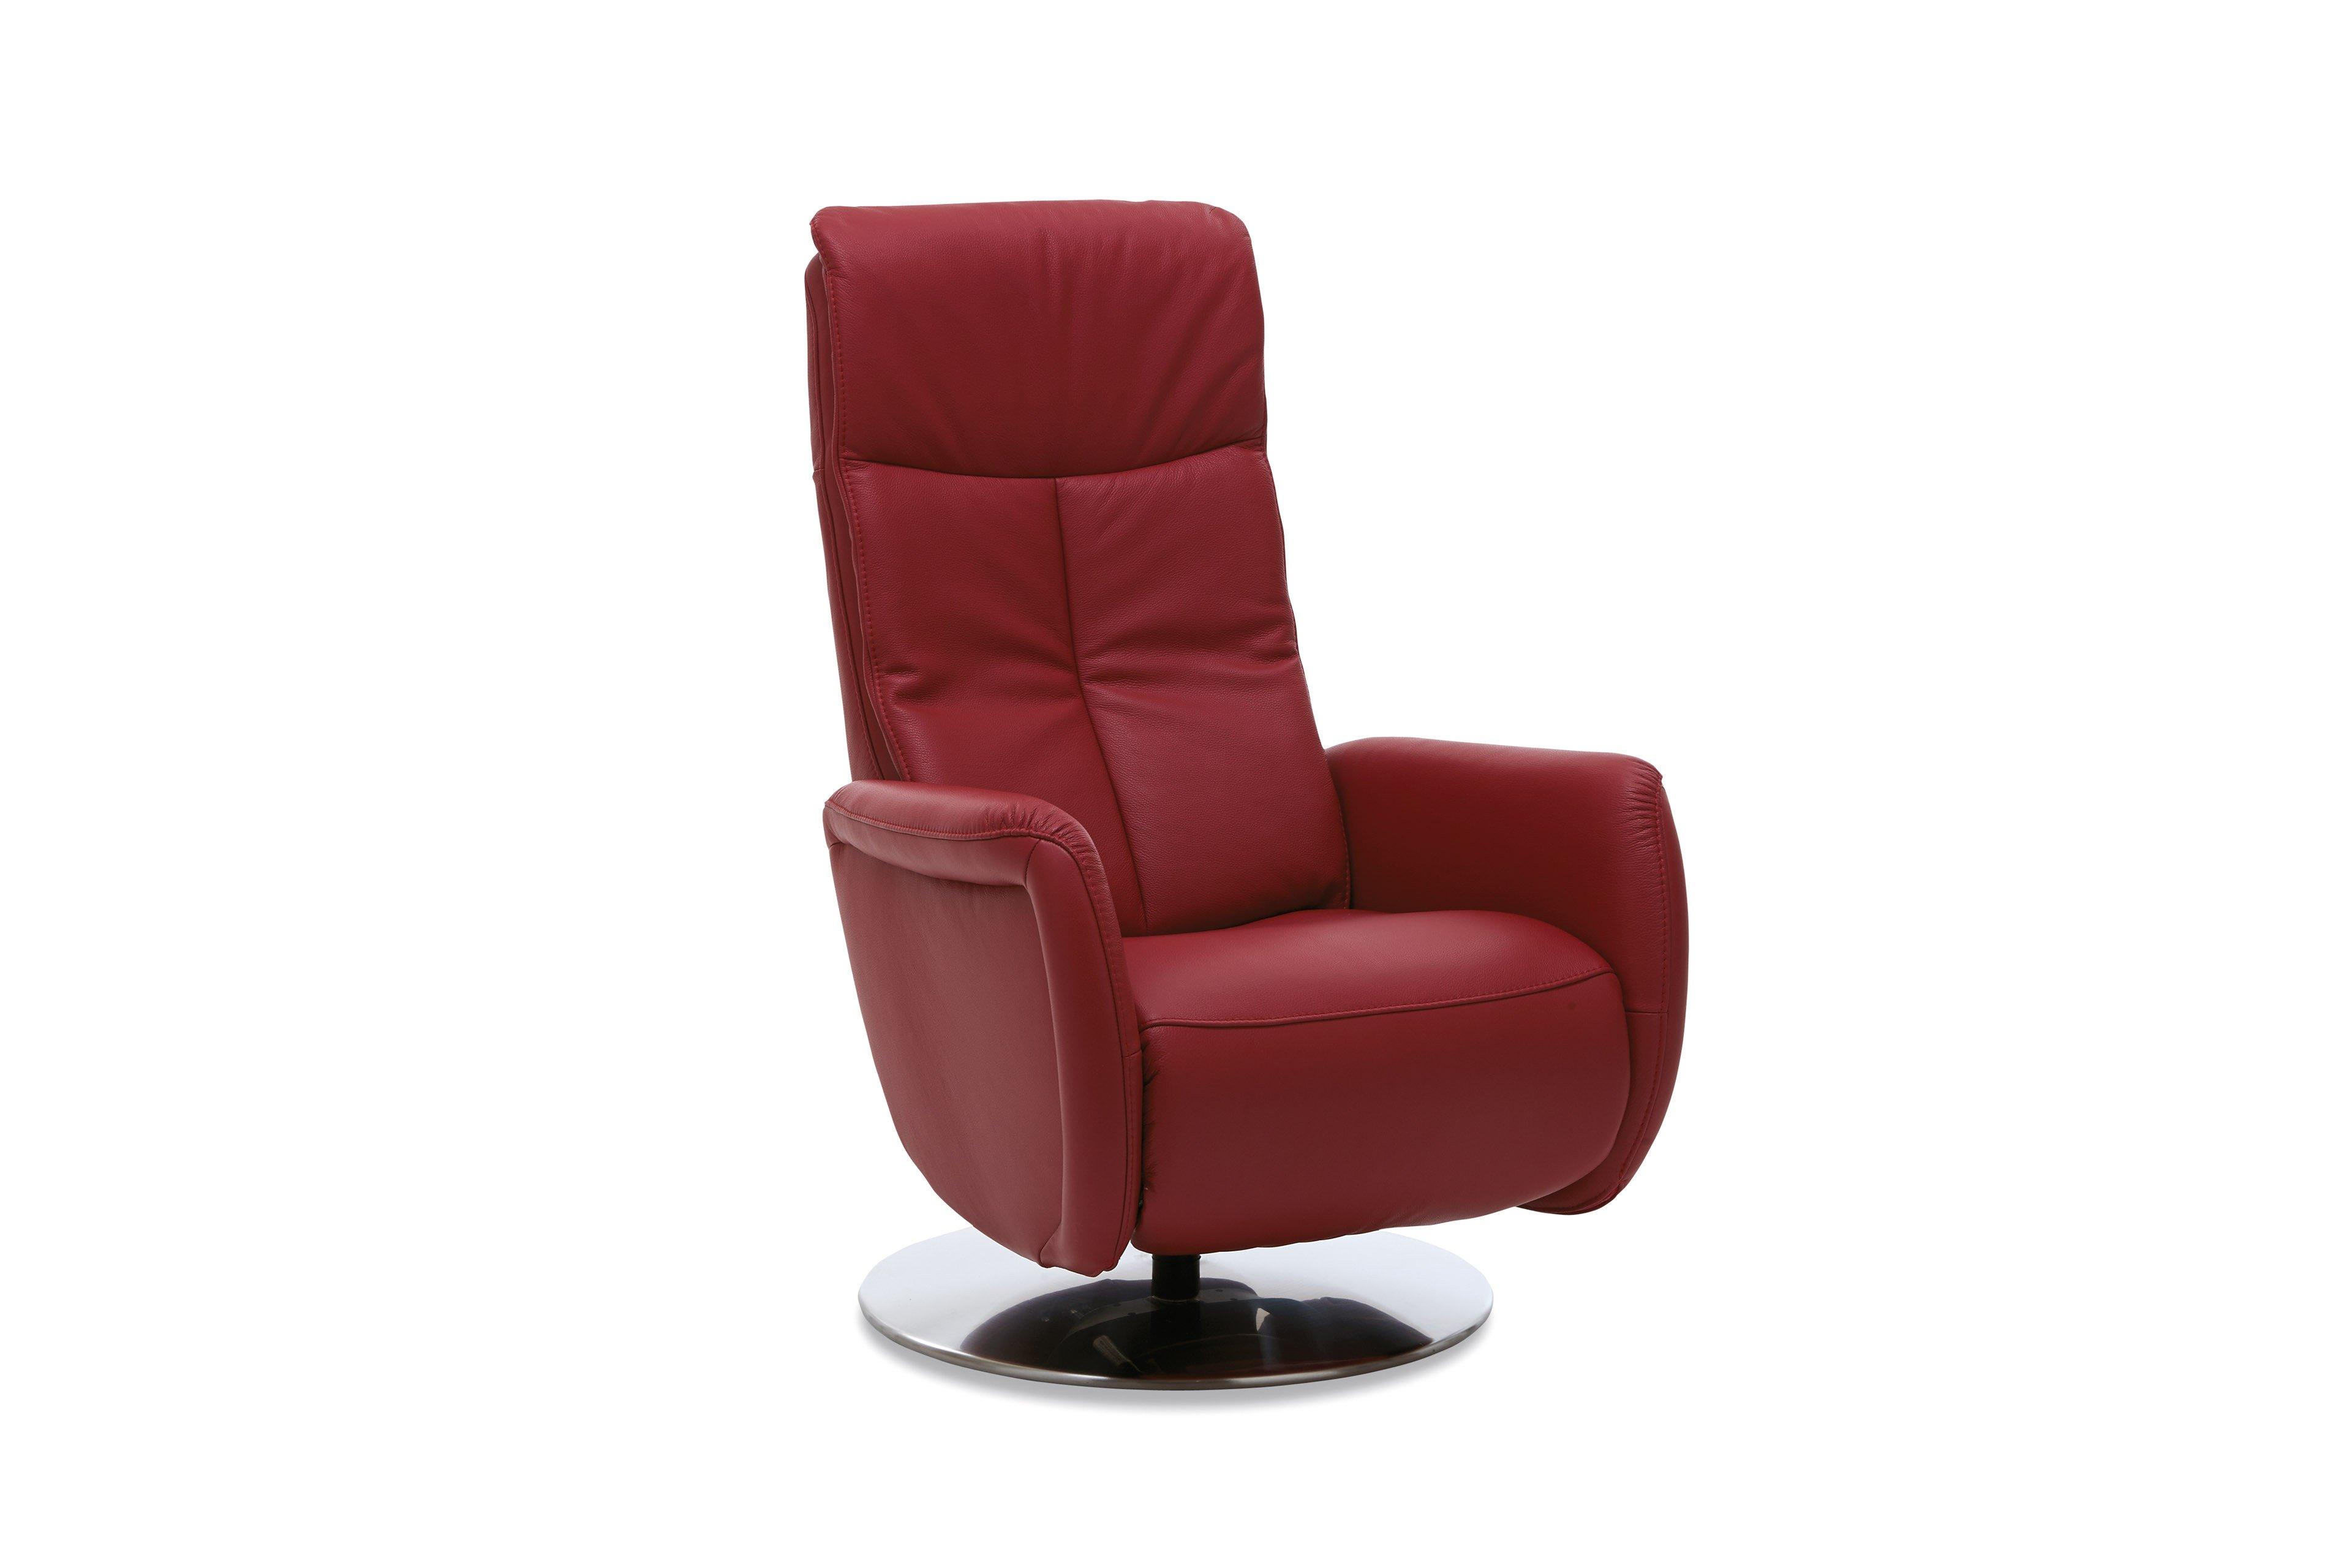 Hukla Smart Ruhesessel In Rot Möbel Letz Ihr Online Shop